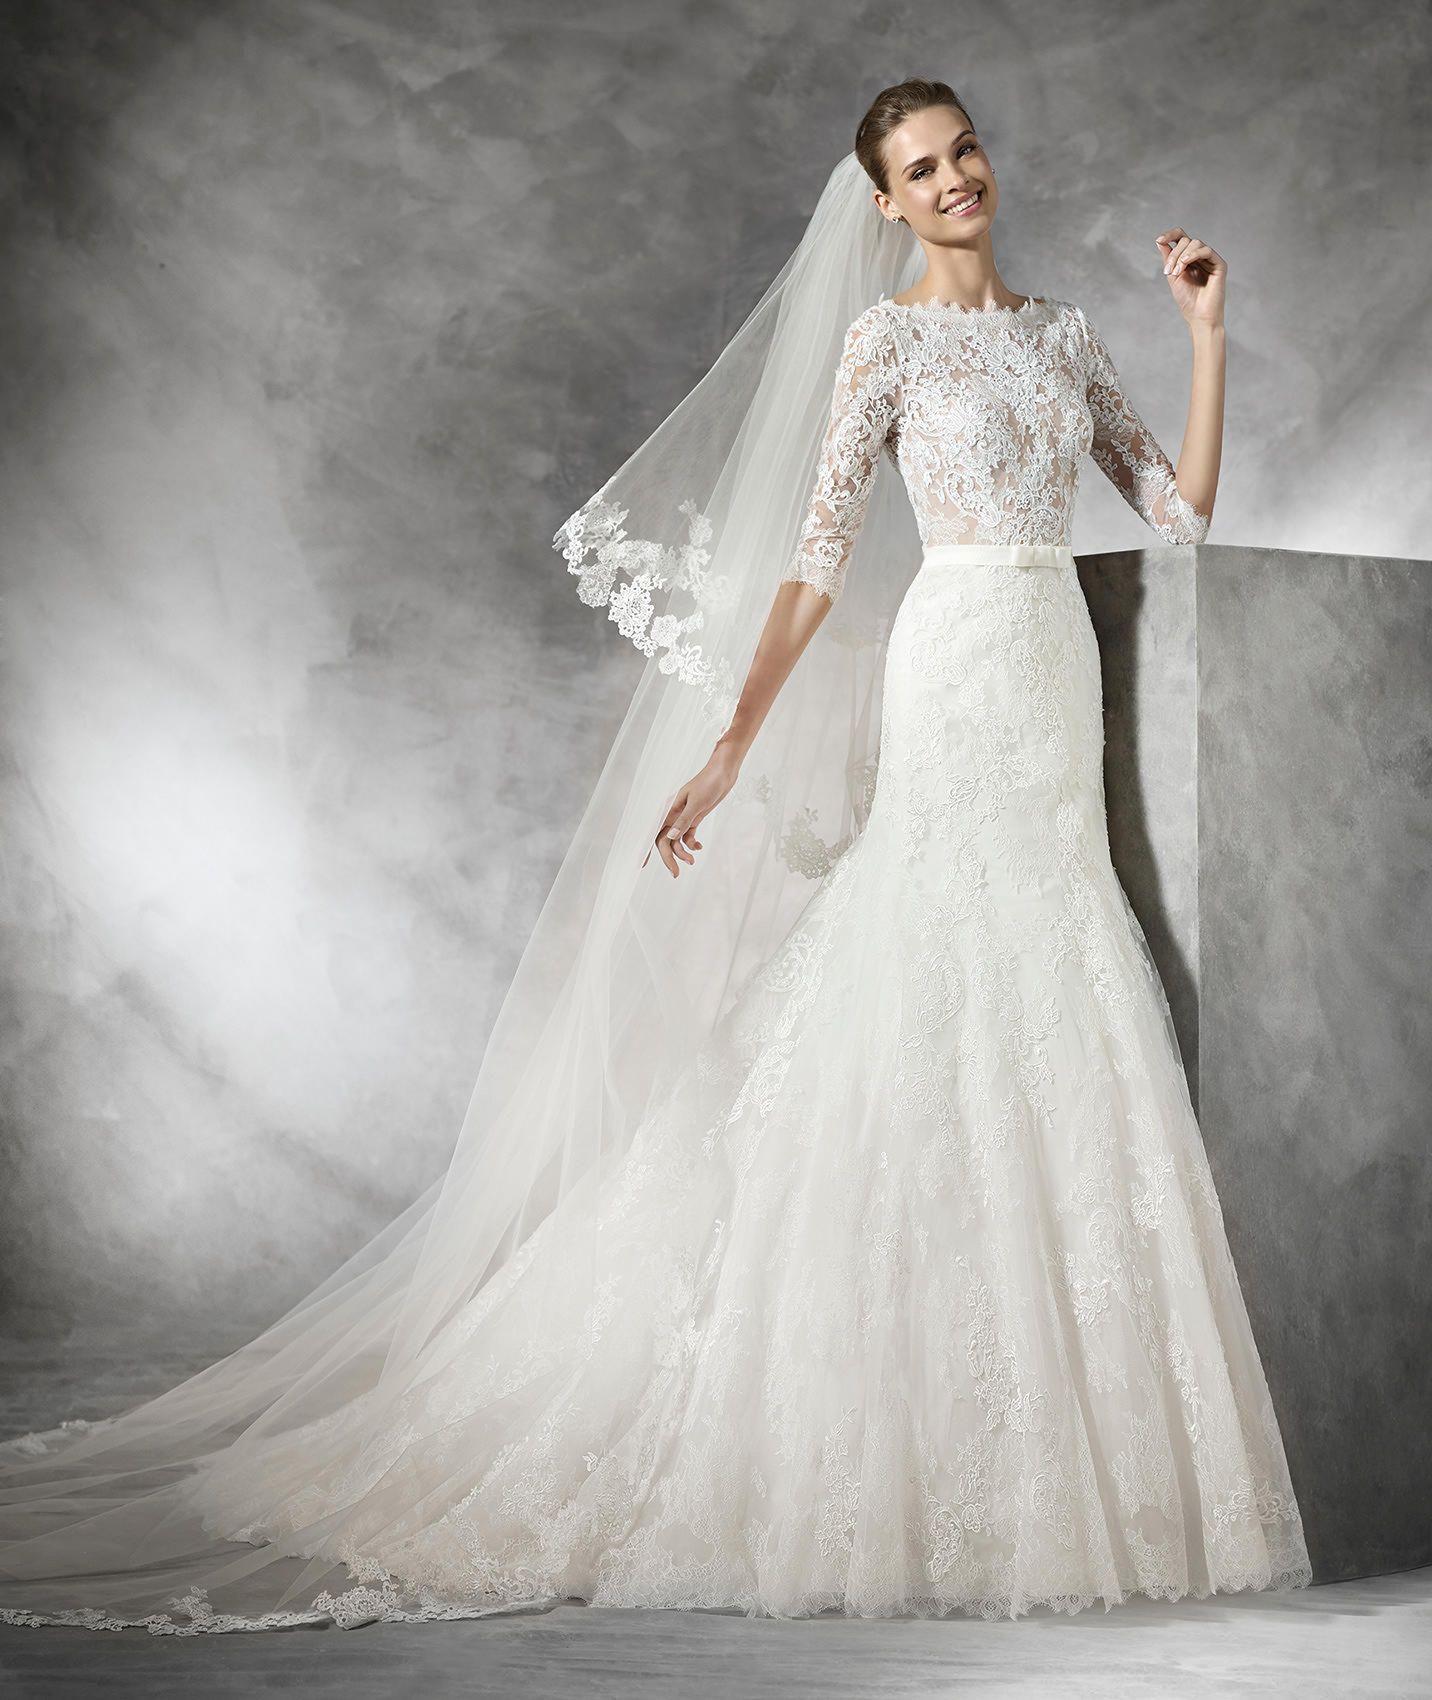 Timy mermaid wedding dress with long sleeves pronovias